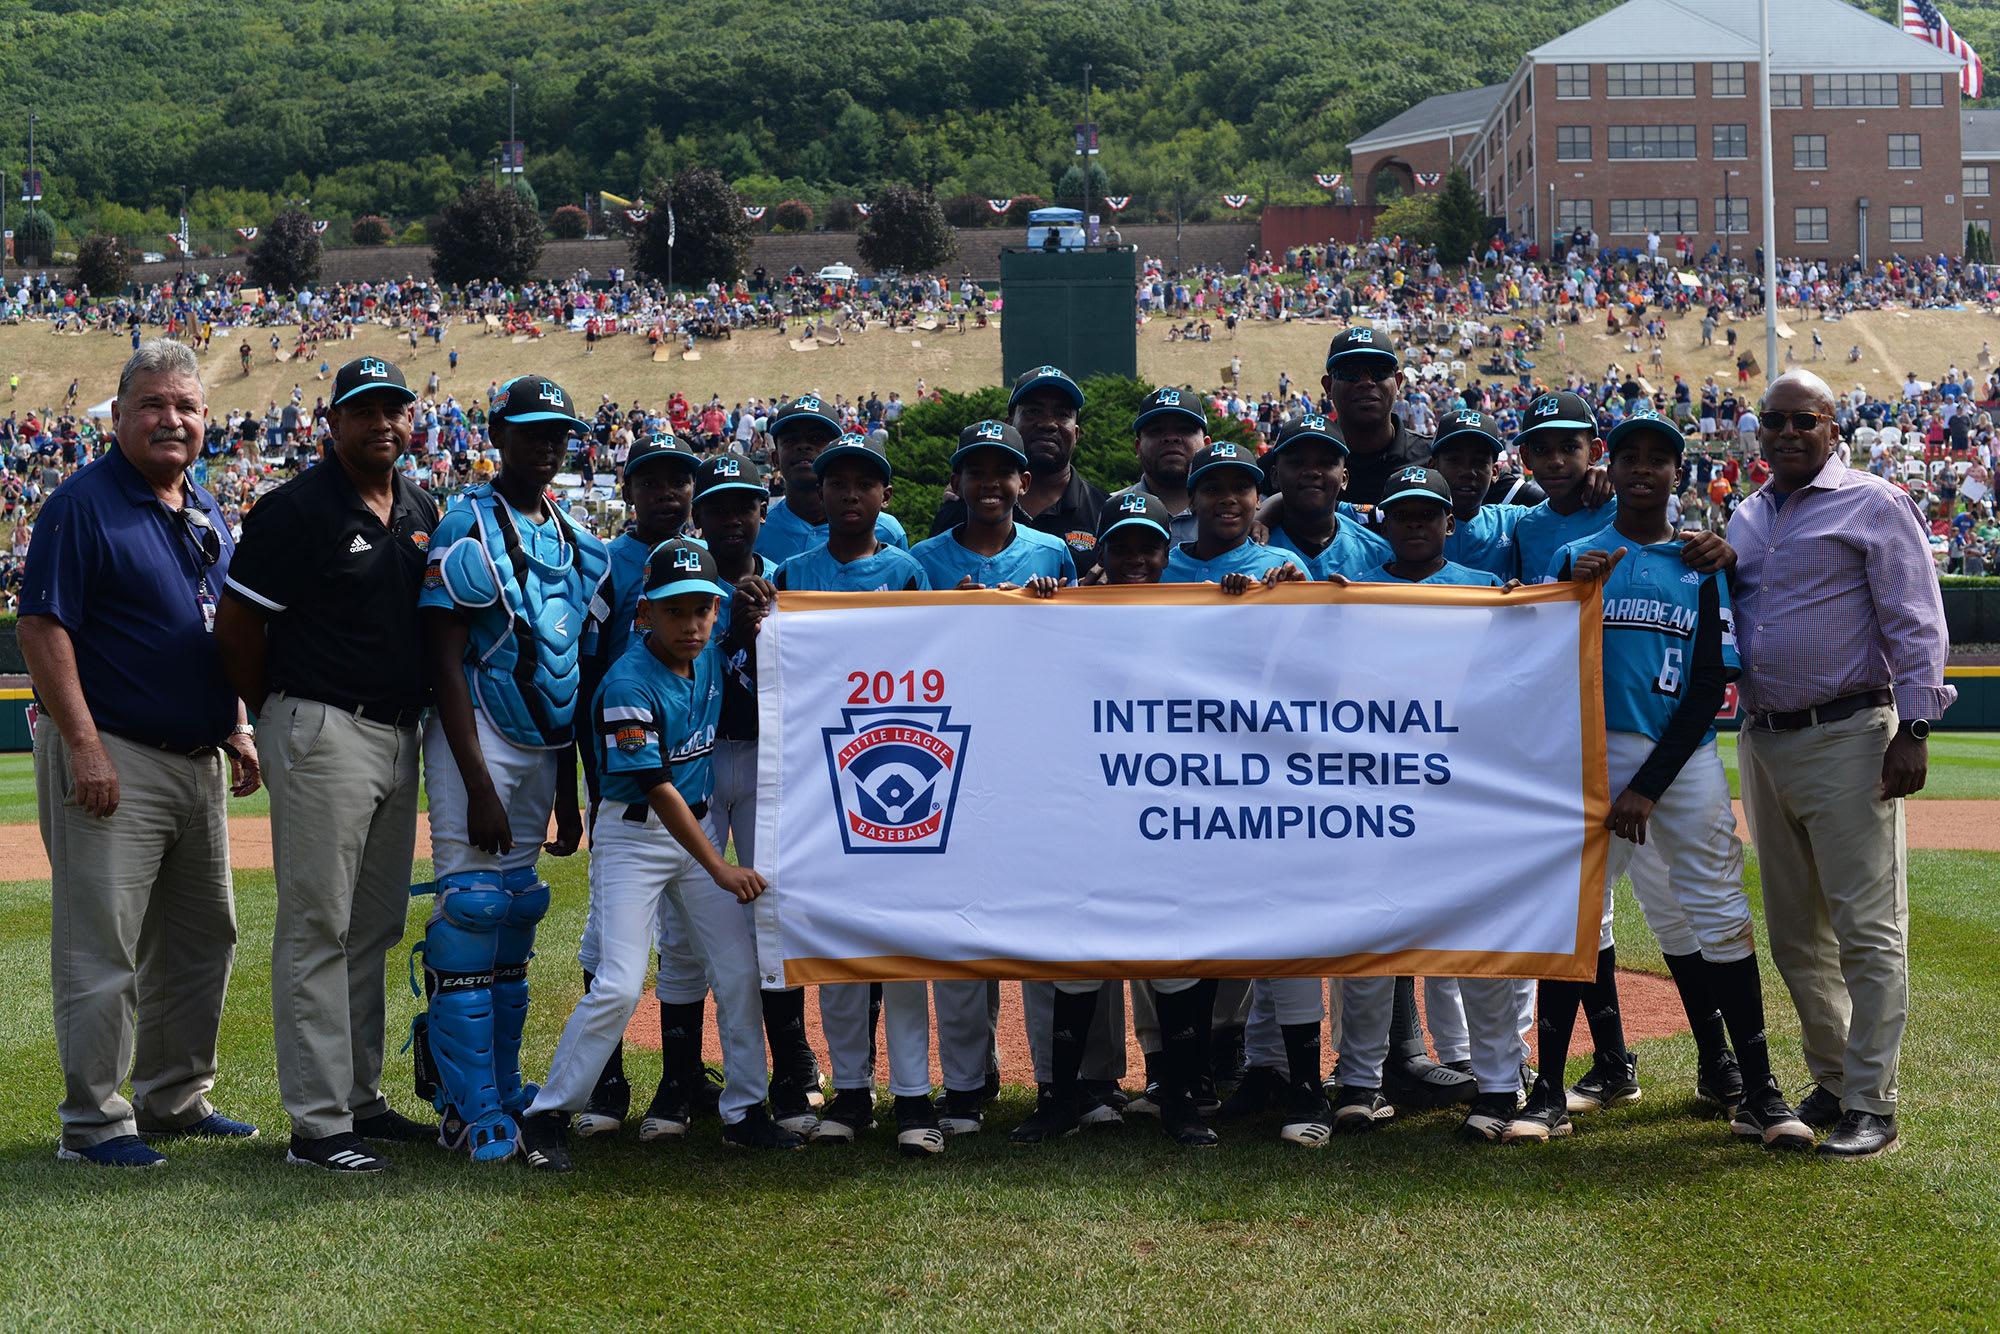 caribbean international champs 2019 llbws